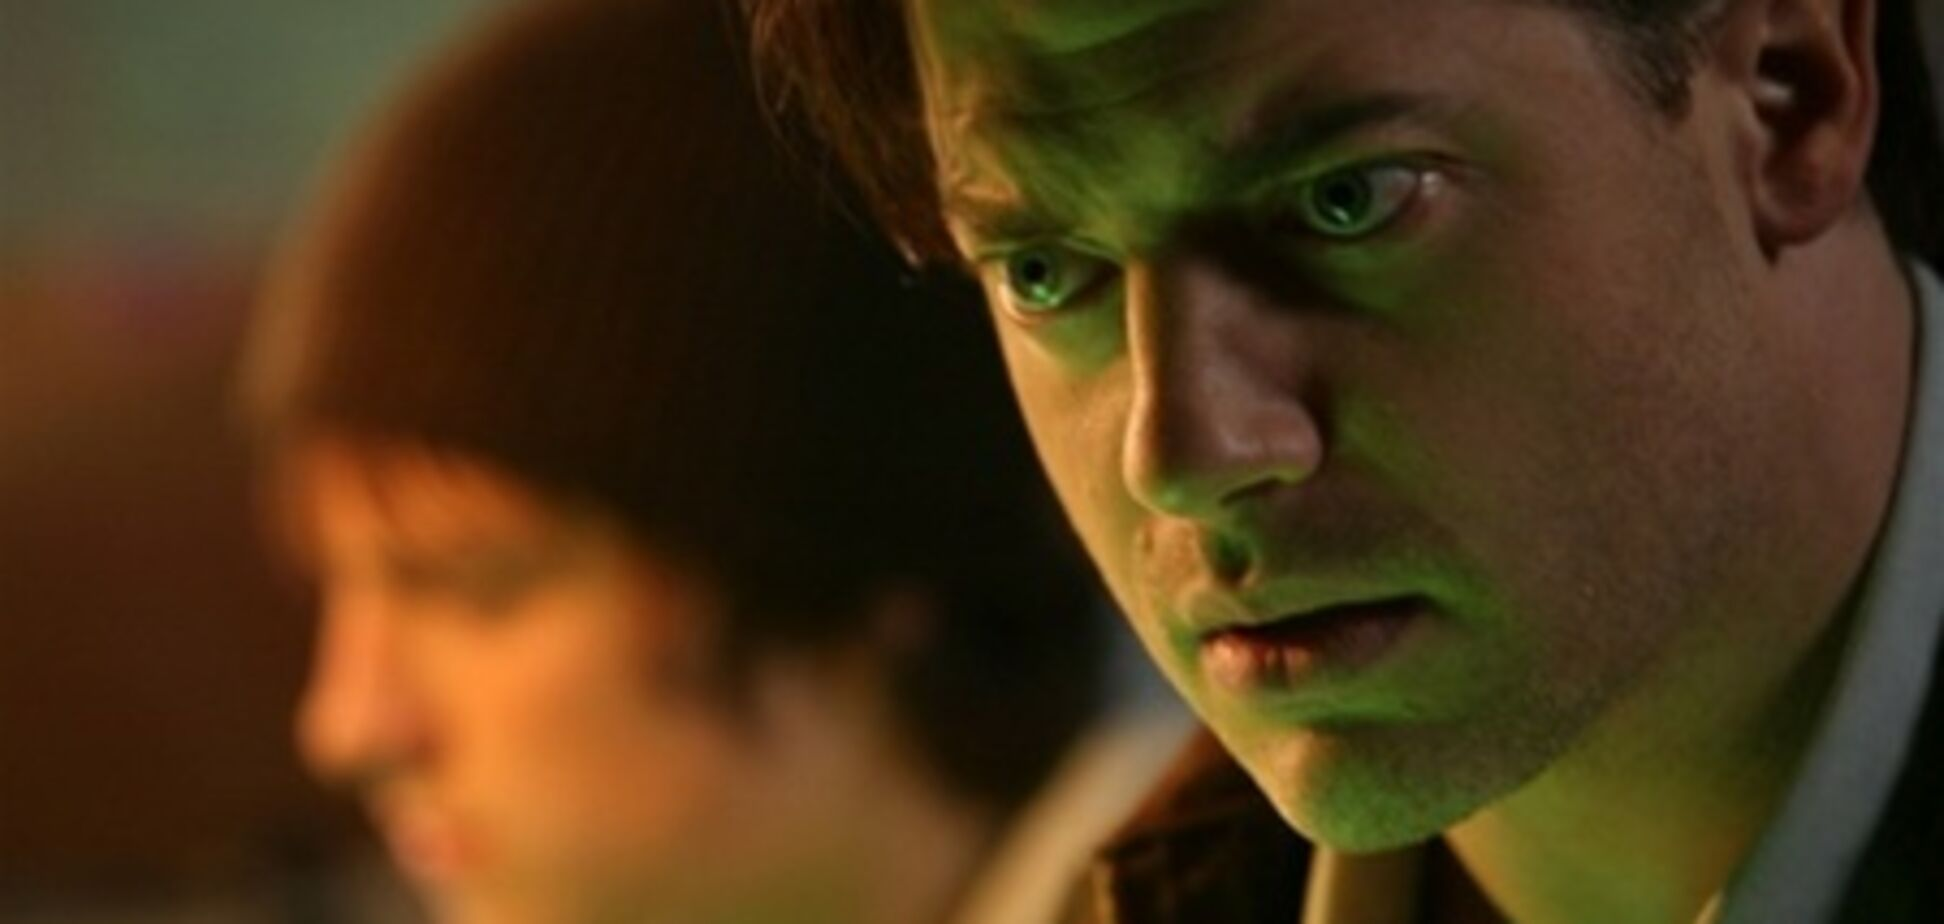 Брендан Фрейзер устроит «Побег с планеты Земля»